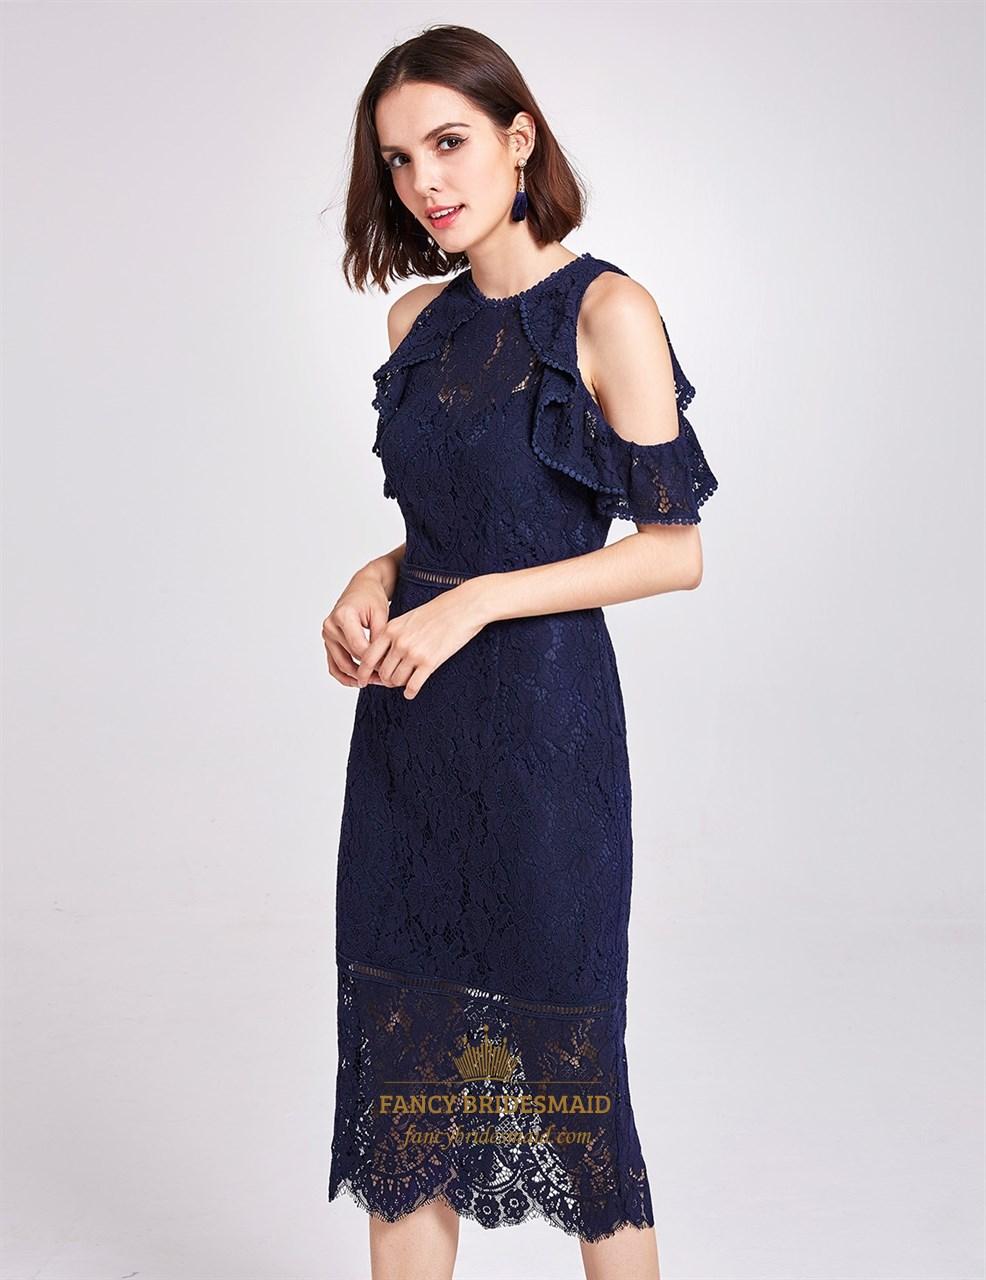 Navy Blue Sleeveless Tea Length Sheath Lace Cocktail Dress ...